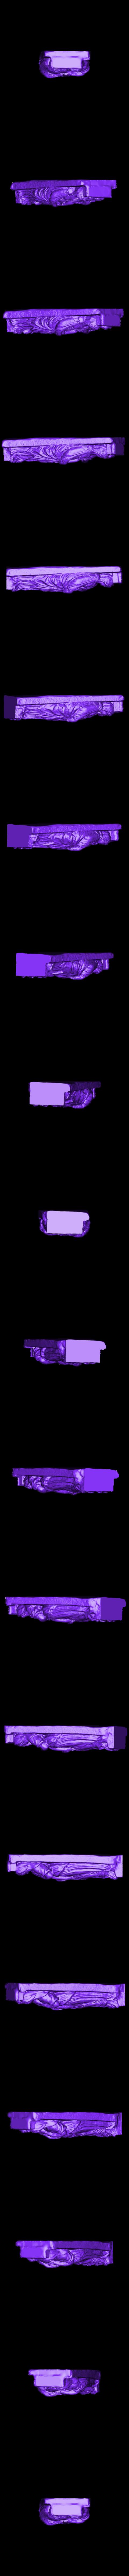 louvre-two-caryatids-1.stl Download free STL file Two Caryatids at The Louvre, Paris • 3D print model, Louvre